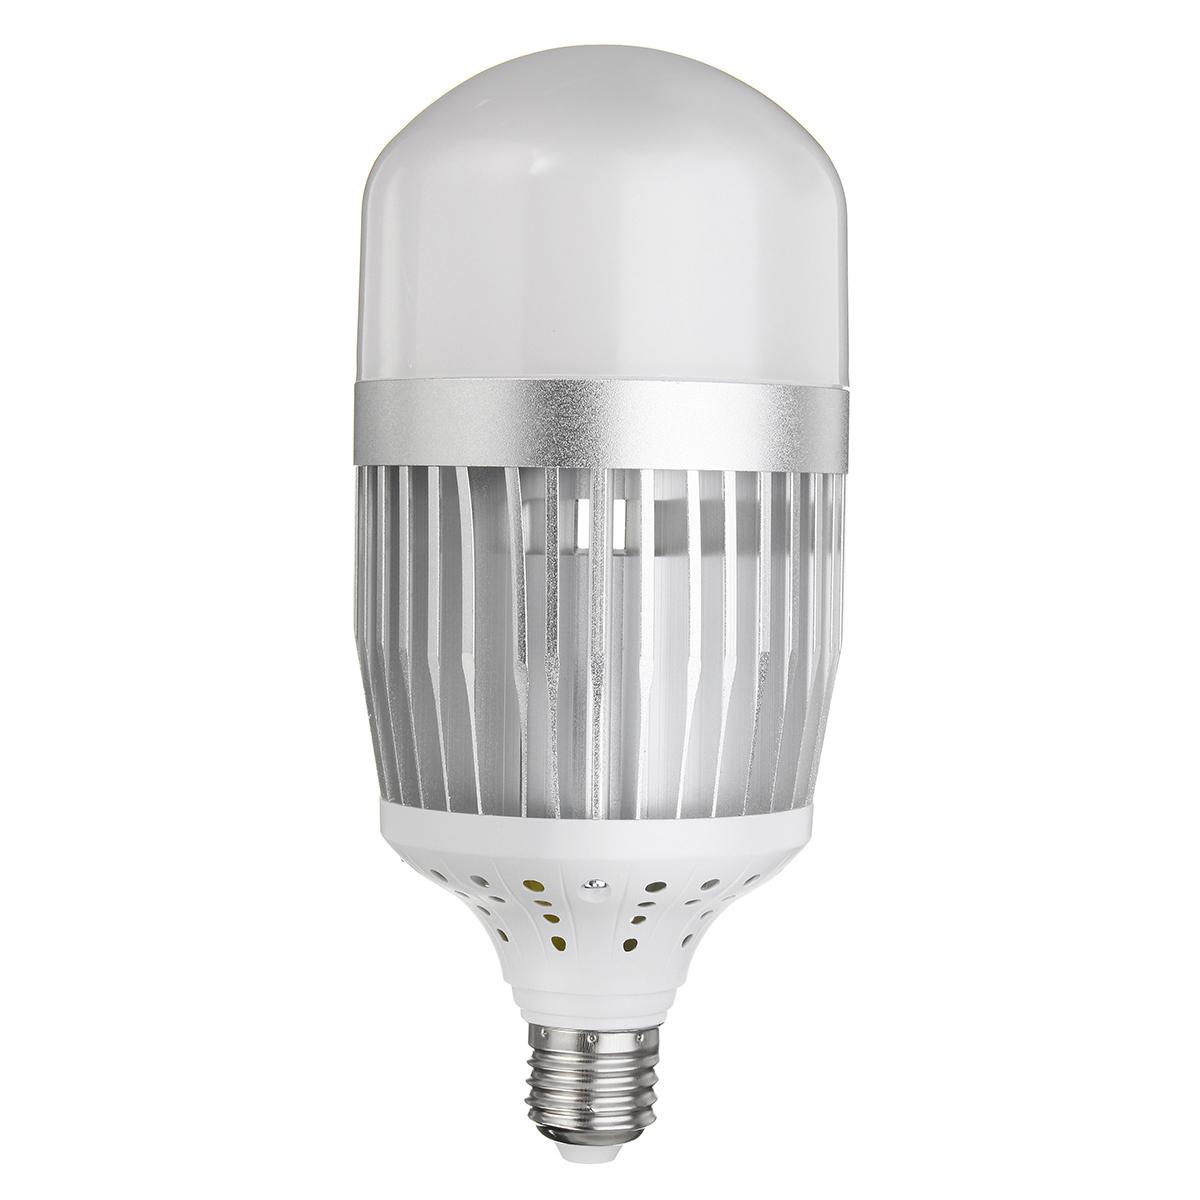 E27 50W SMD3030 30LEDs 100LM/W Warm White Pure White High Bay Light Bulb Factory Lamp AC85-265V